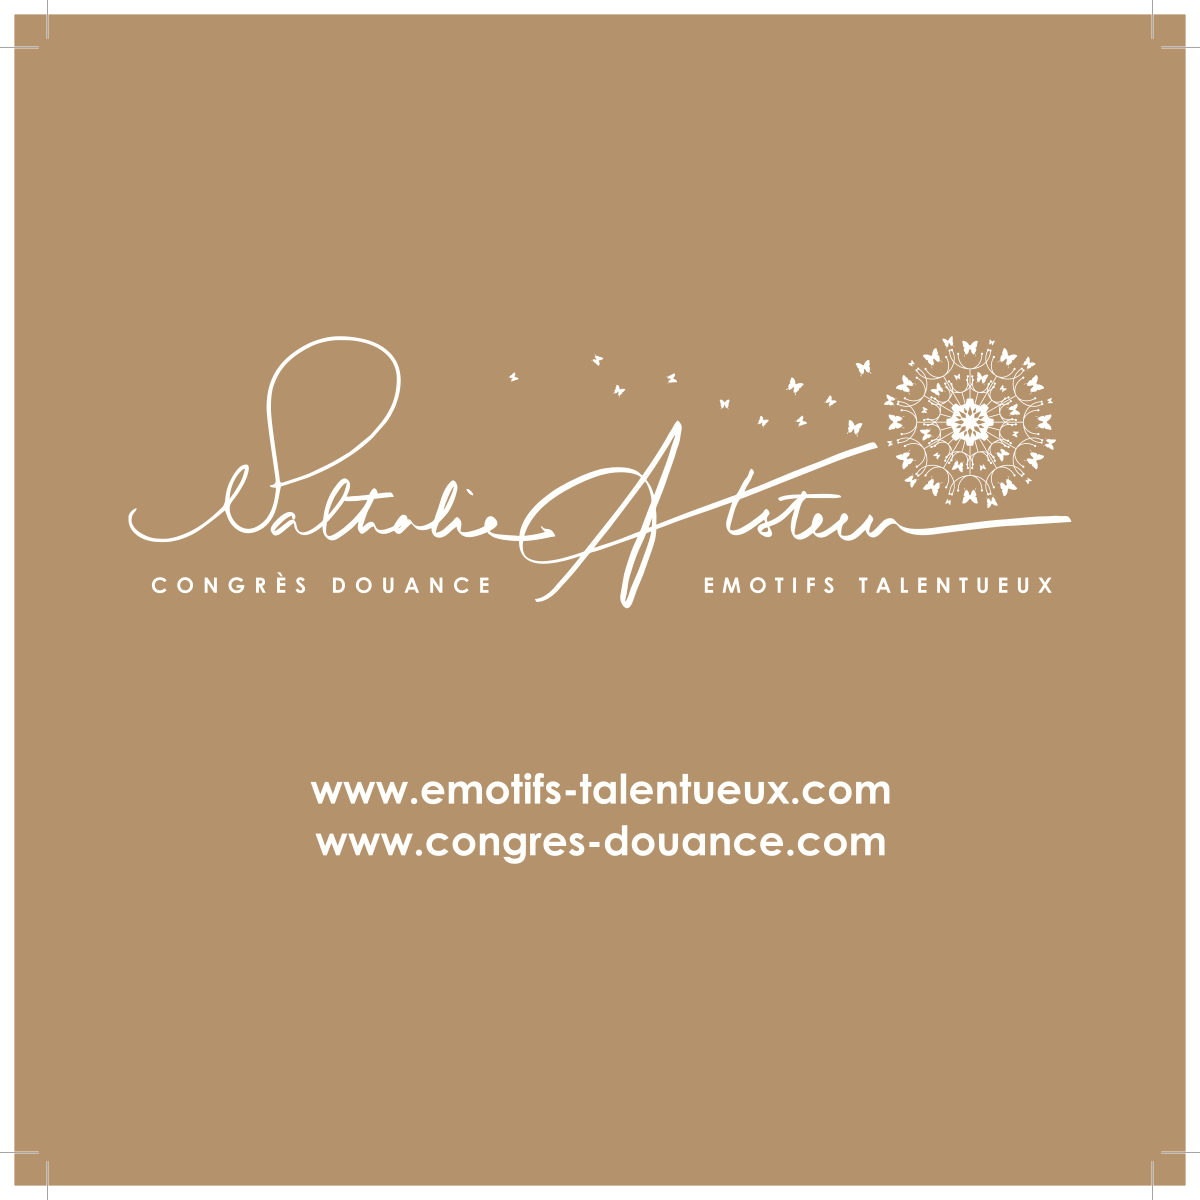 Emotifs-Talentueux Business Card